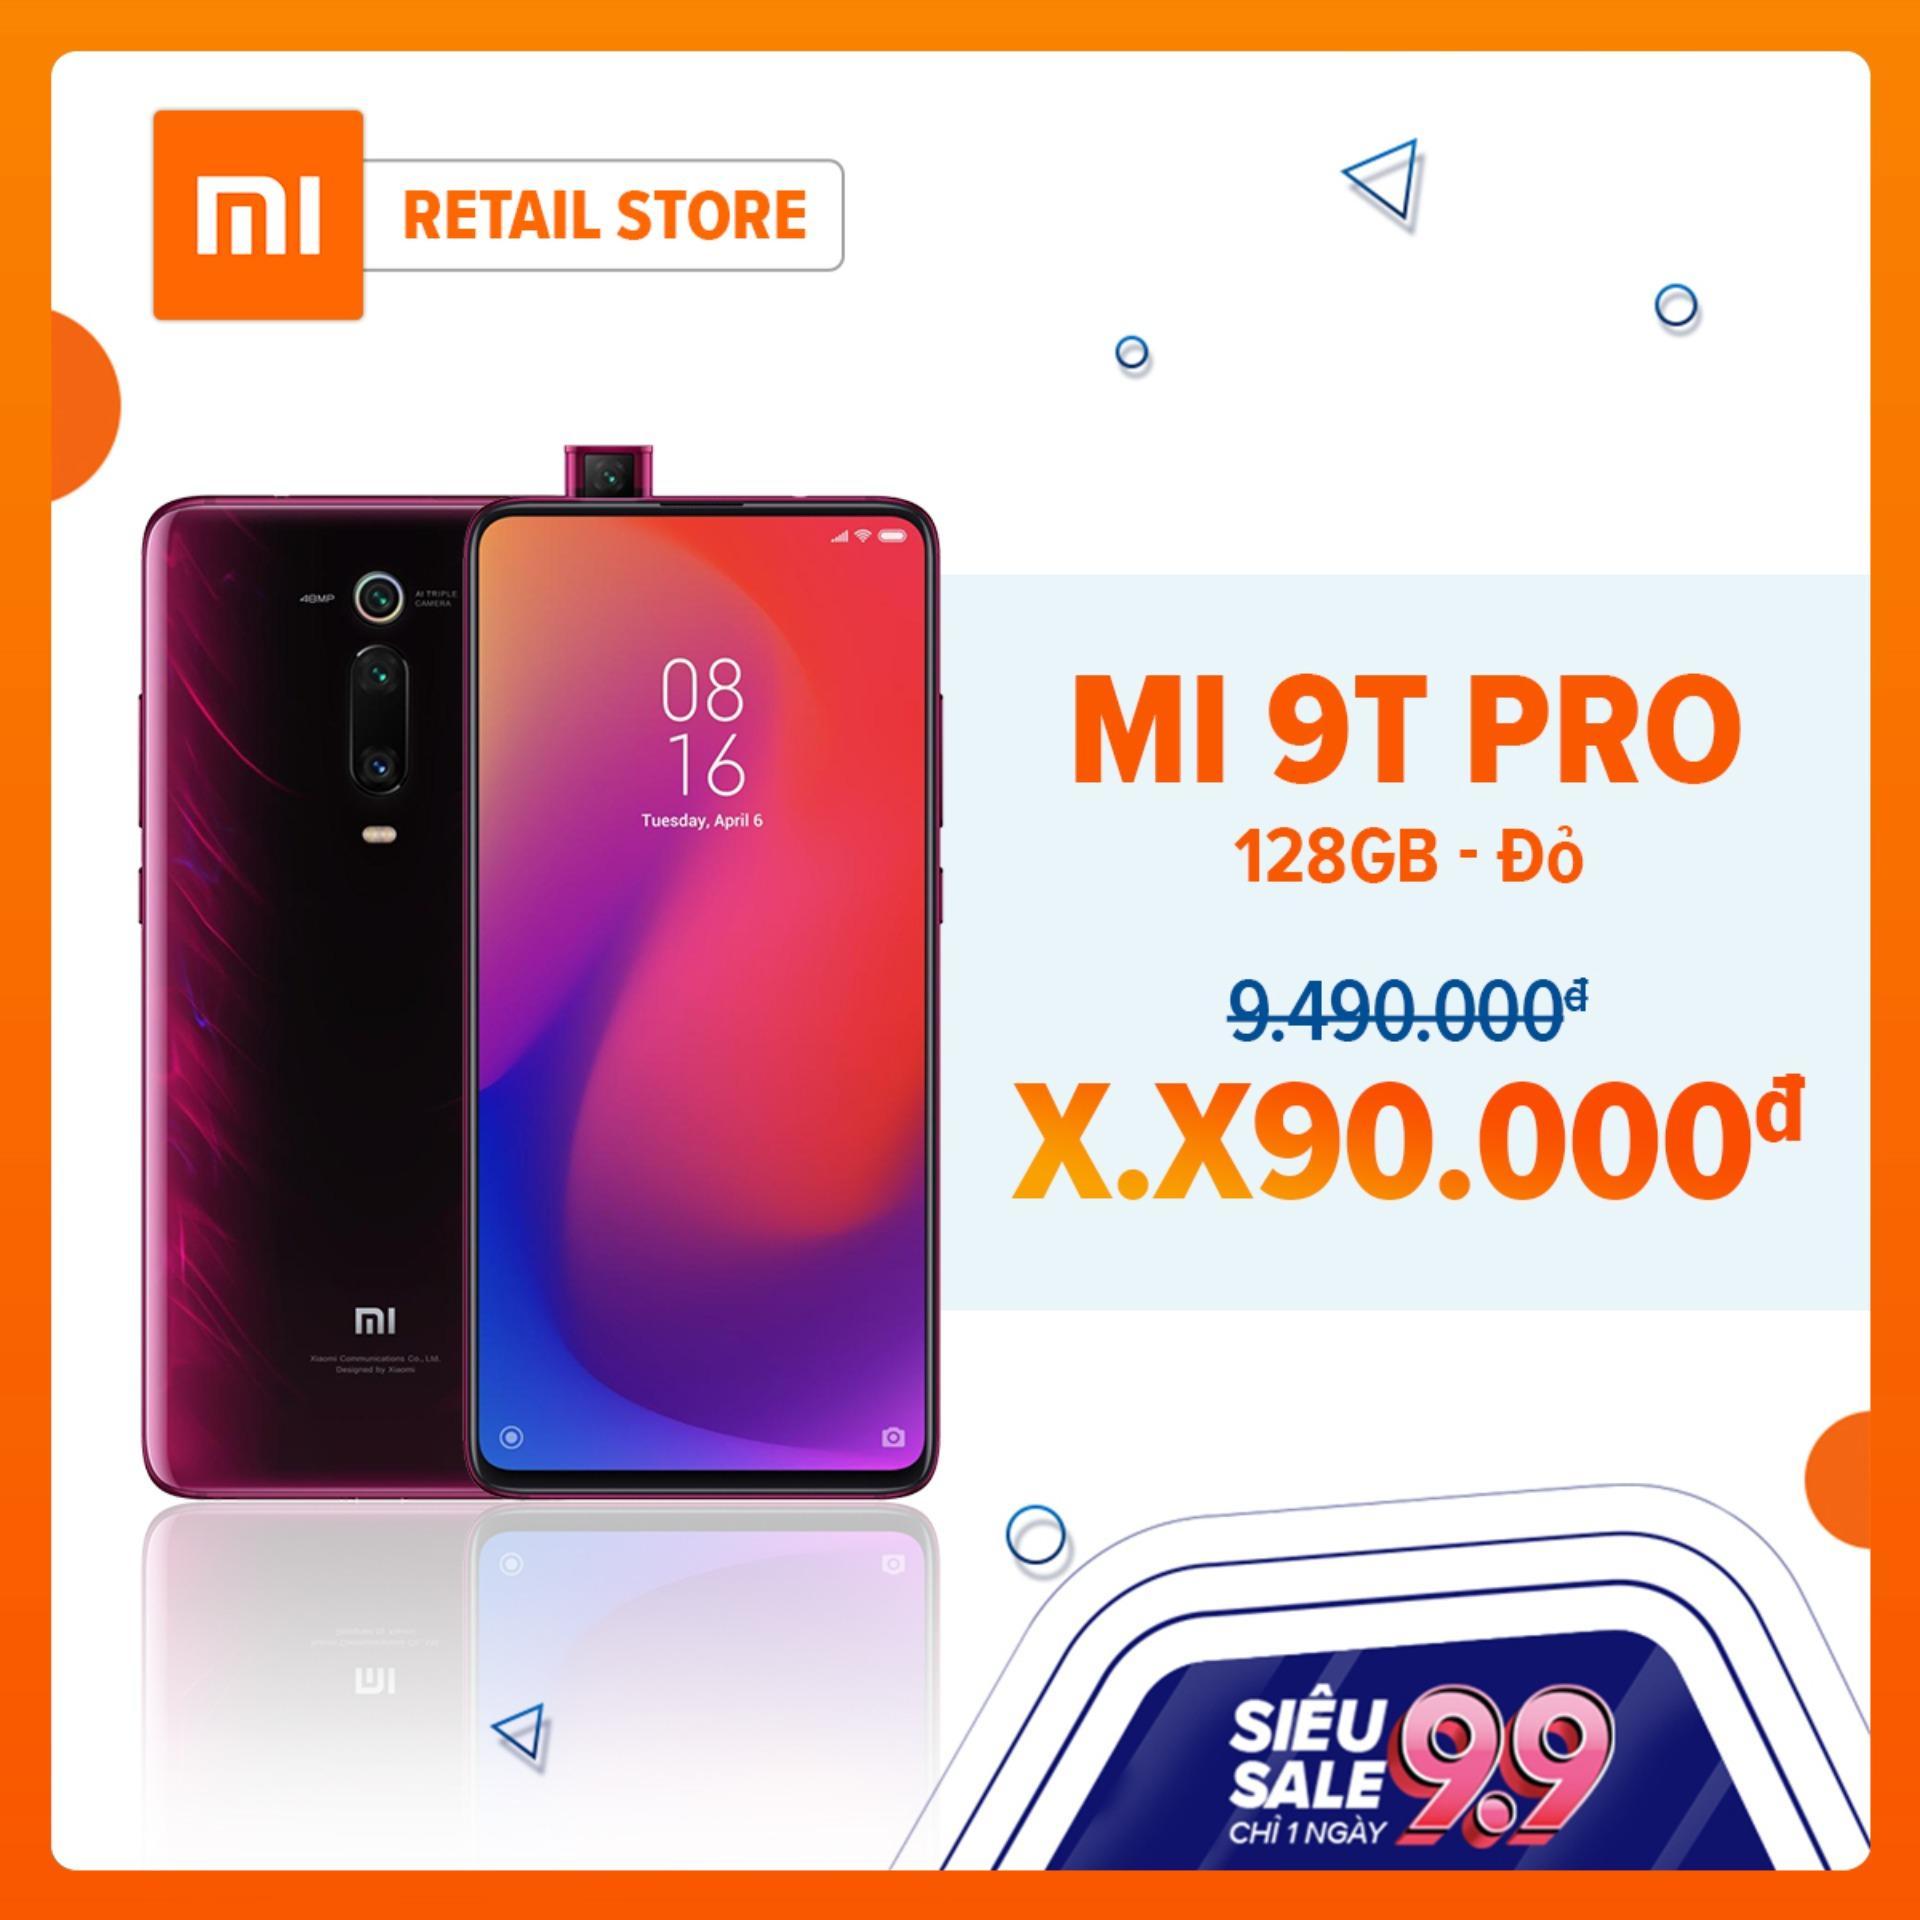 [Độc quyền sale 99] Điện Thoại Xiaomi Mi9T Pro (6GB/128GB)...